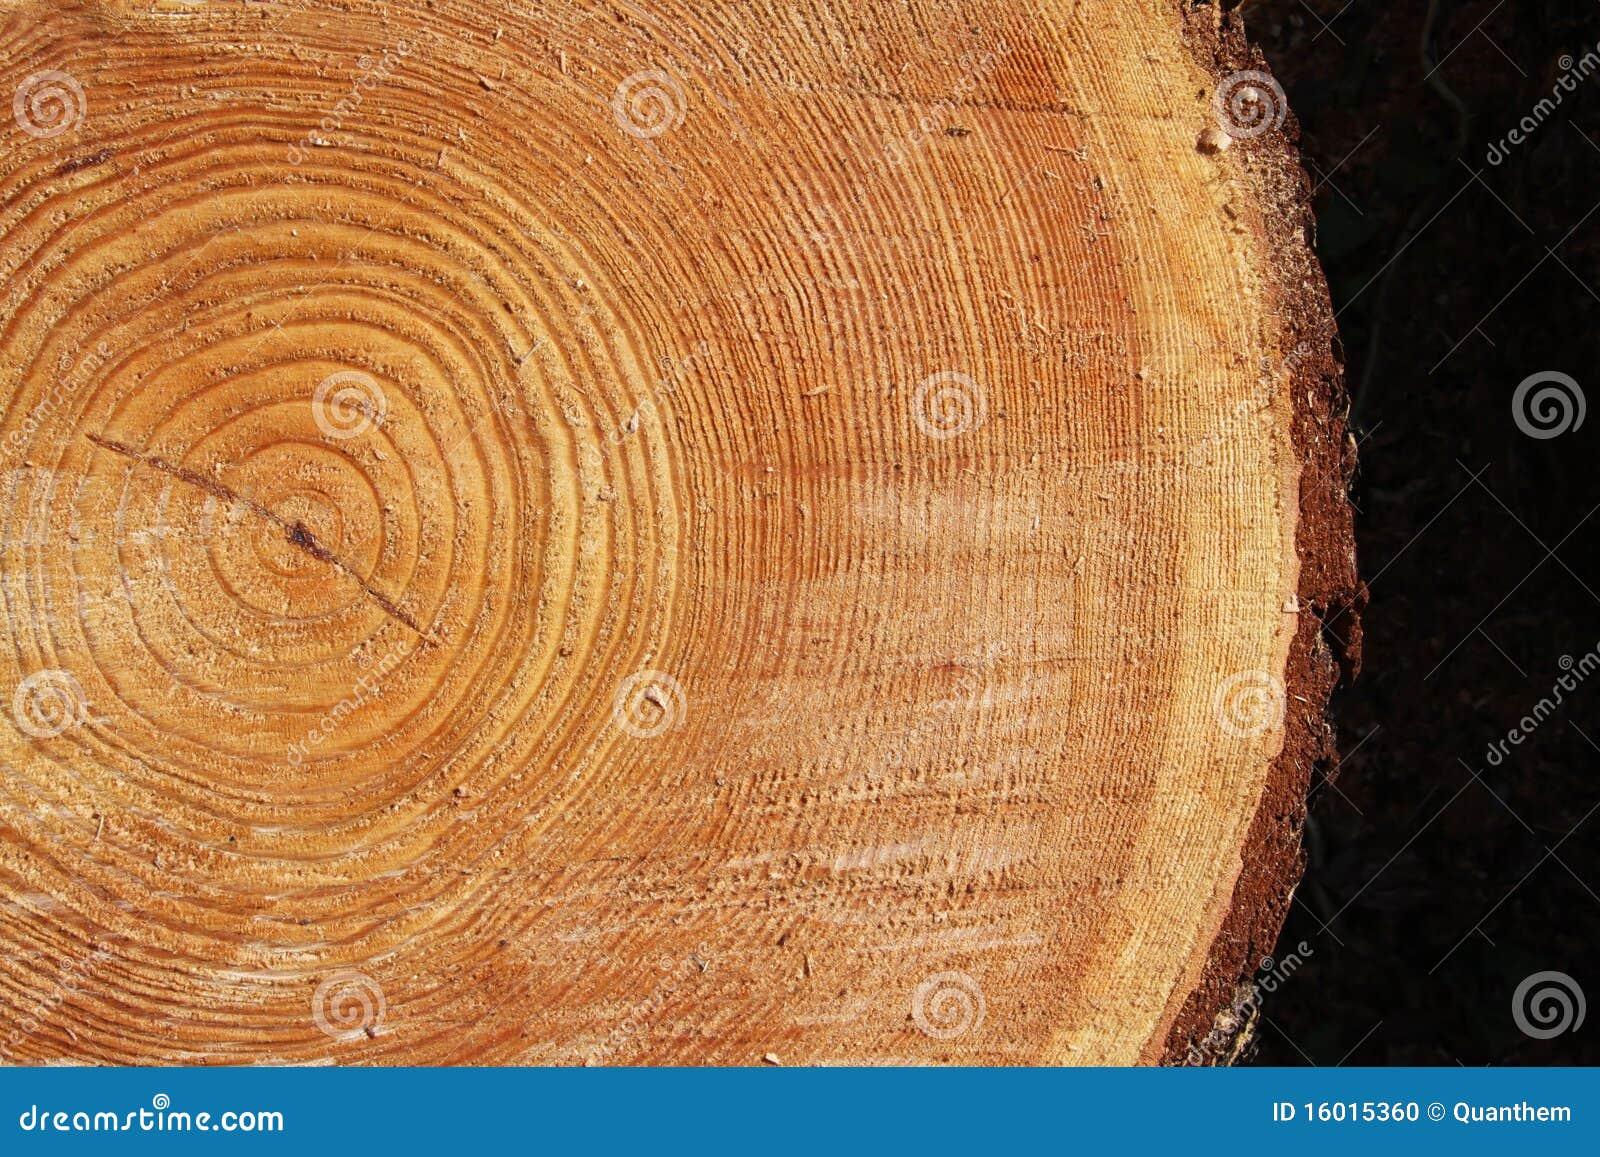 Sección representativa de un árbol